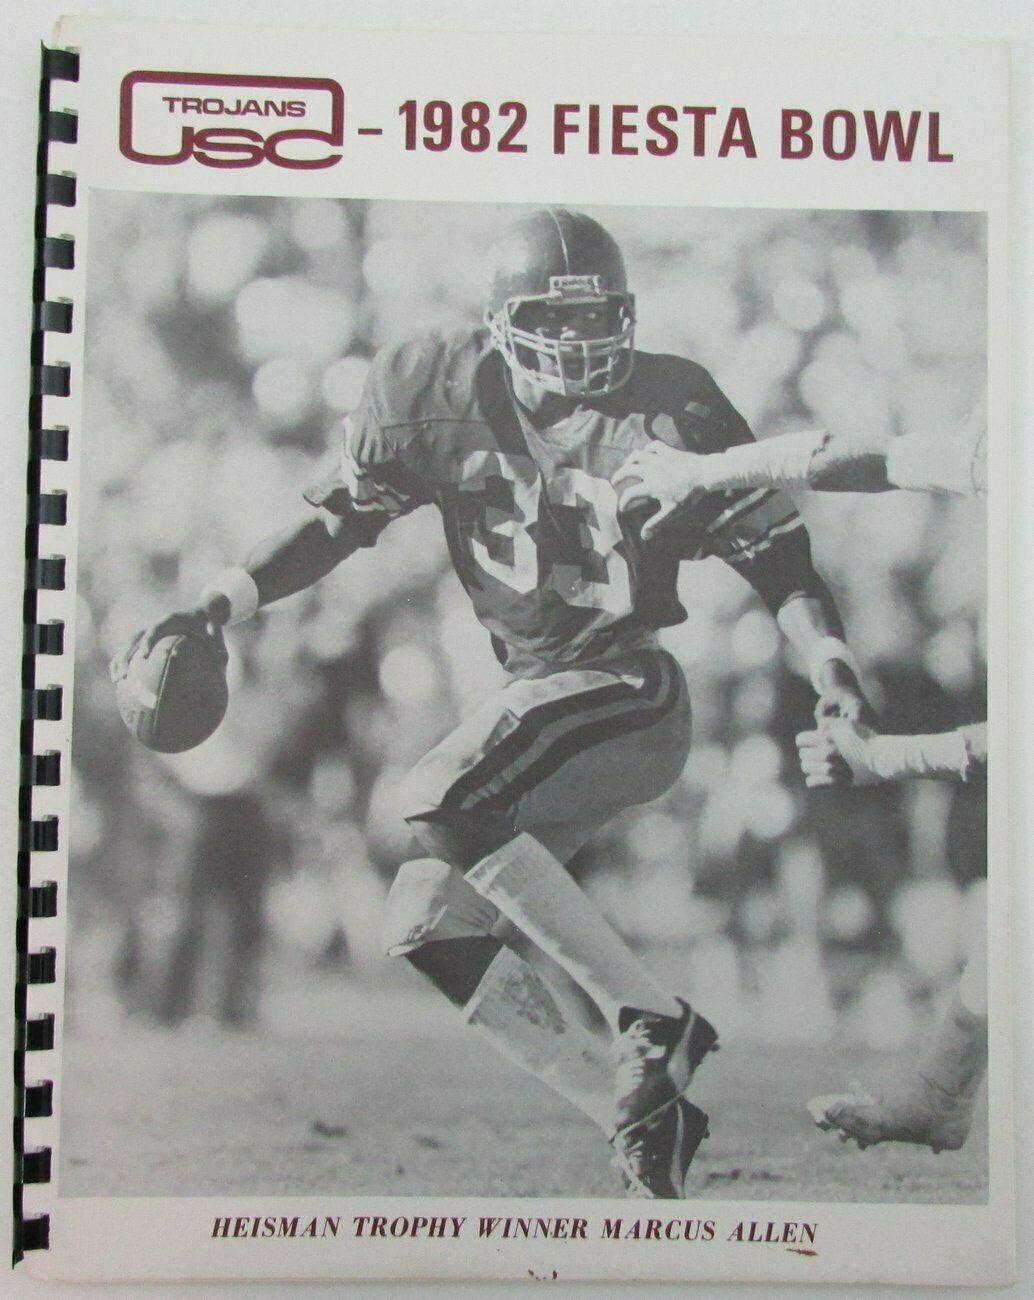 Virginia New Orleans Mall Beach Mall 1982 Fiesta Bowl USC Trojans Media Marcus Penn Allen Guide State